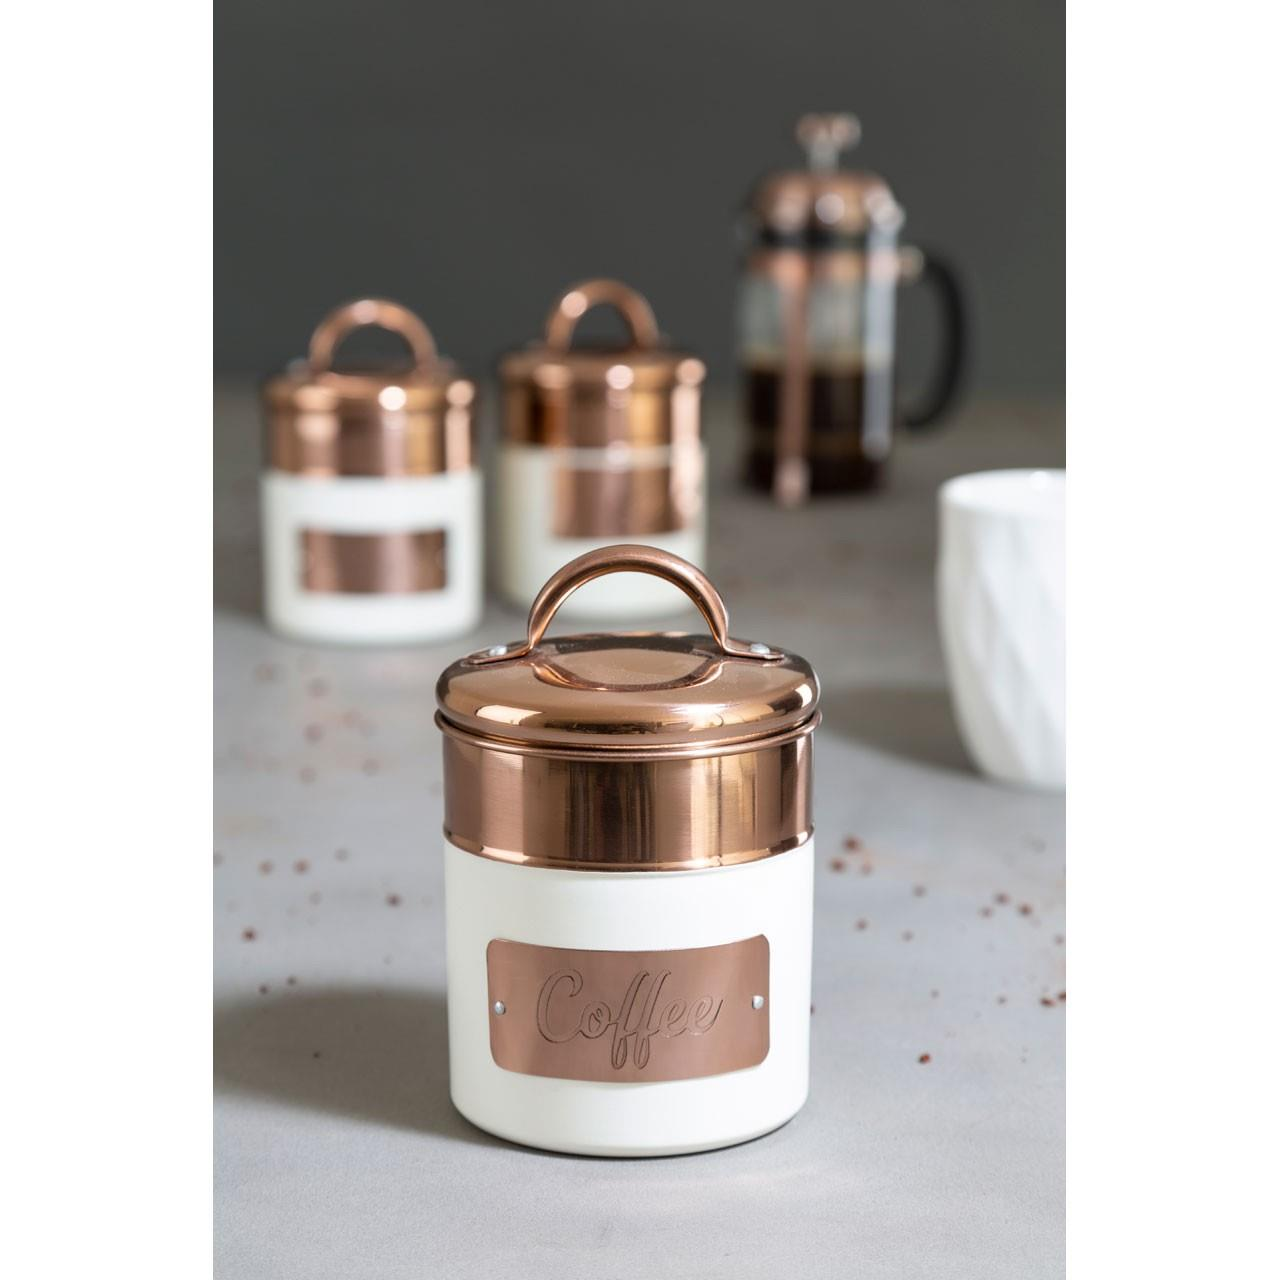 Prescott-Cream-Copper-Bread-Bin-Biscuit-Sugar-Coffee-Canister-Utensil-Holder thumbnail 17